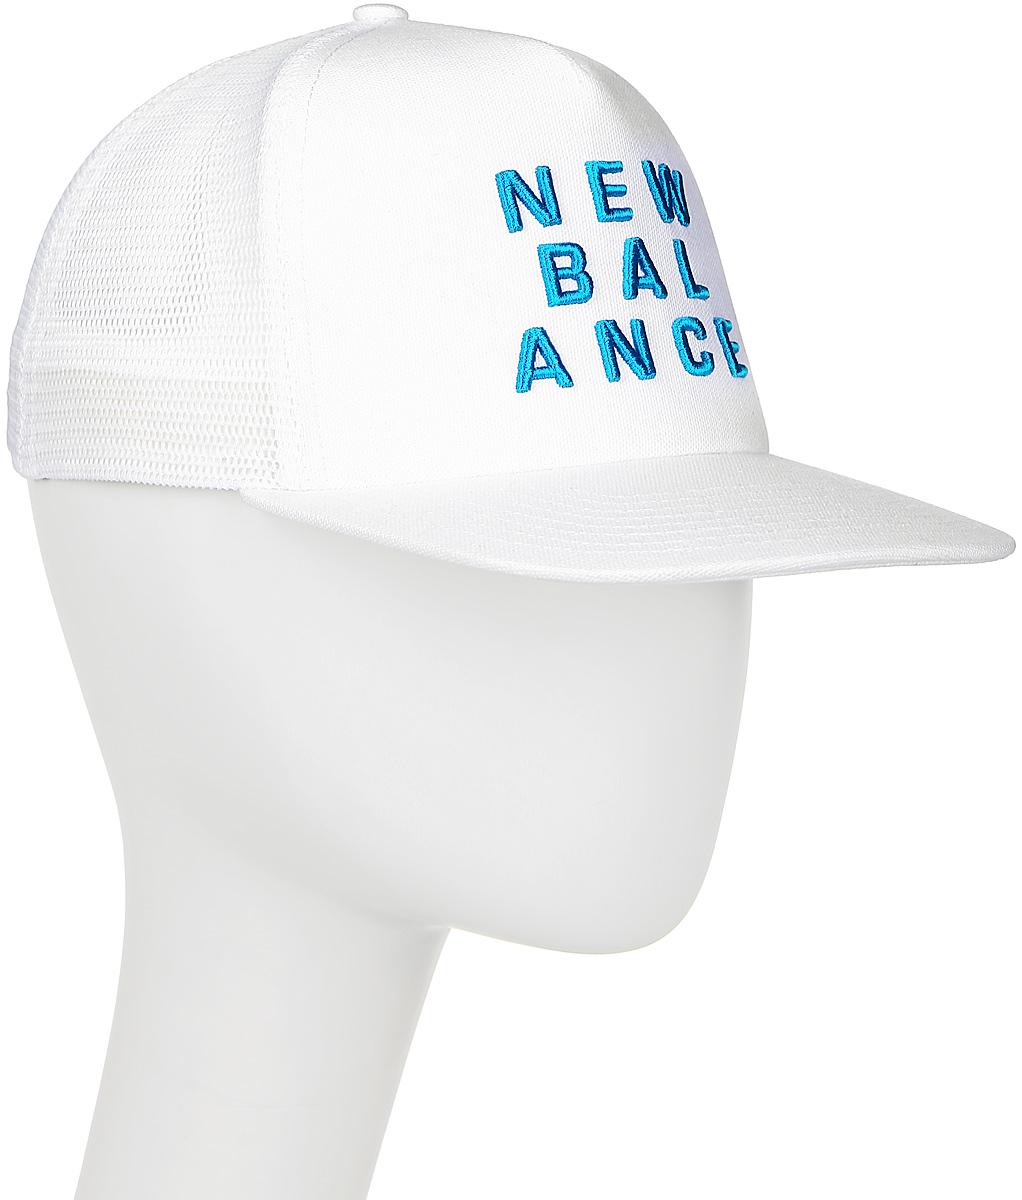 Бейсболка New Balance Foam Trucker, цвет: белый. 500135/WH. Размер универсальный бейсболка the north face mudder trucker hat цвет хаки бежевый t0cgw2scg размер универсальный